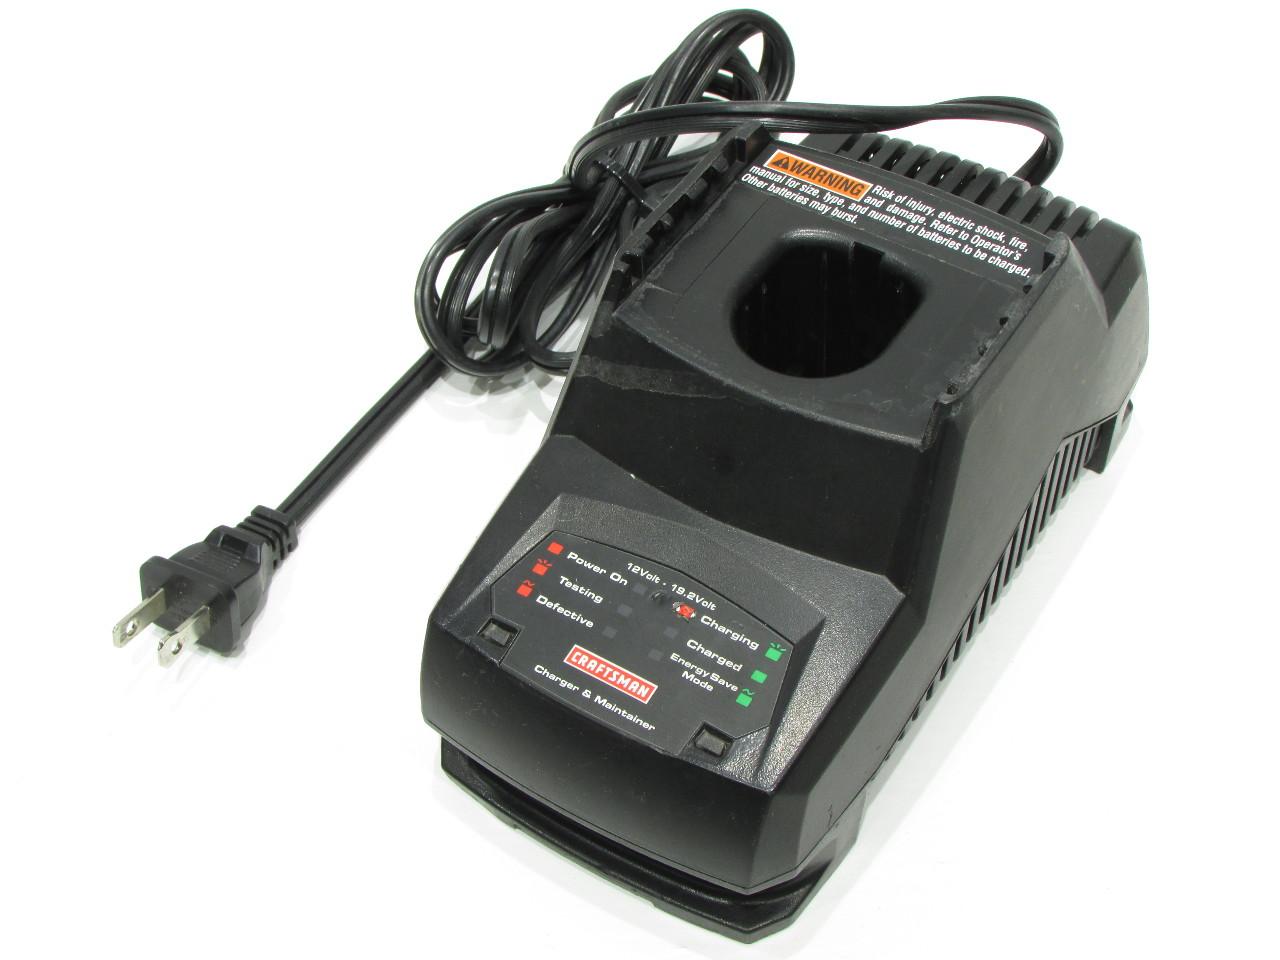 Craftsman 192 Volt Battery Charger Manual